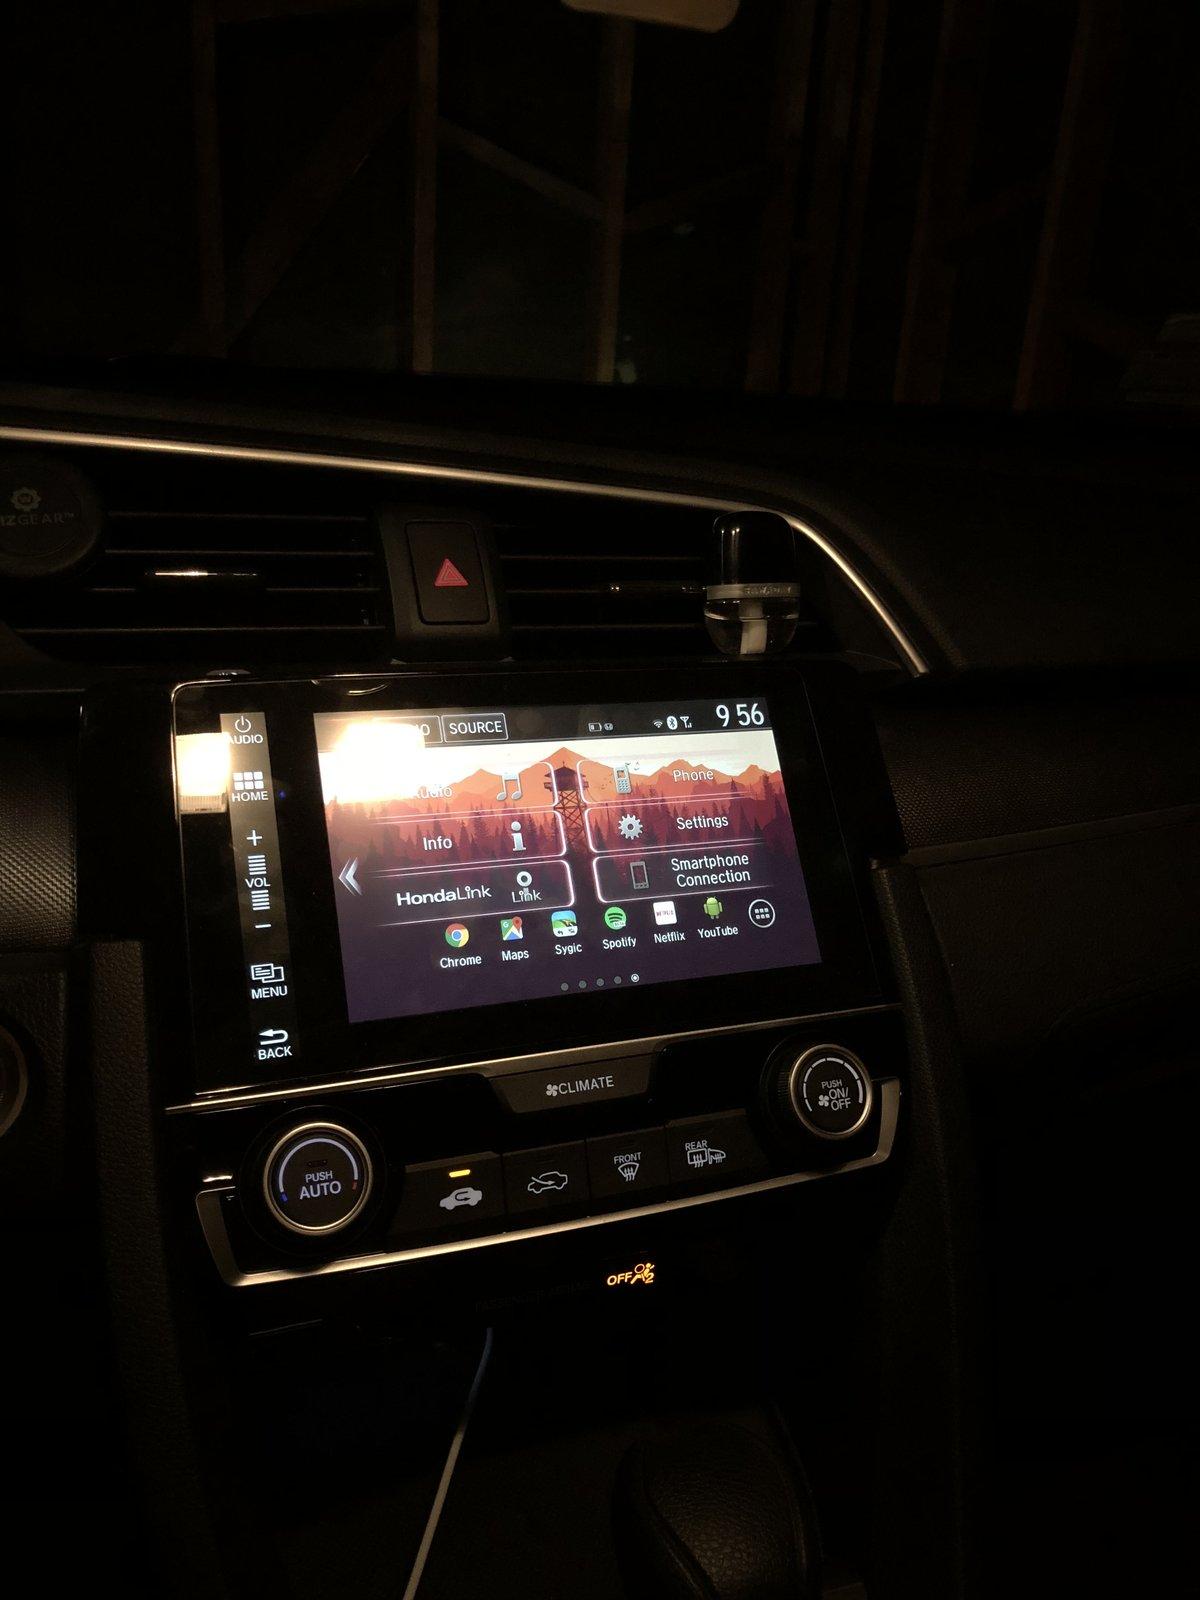 2016 Honda Civic Dashboard : honda, civic, dashboard, Dash/infotainment, Customization?, 2016+, Honda, Civic, Forum, (10th, Forum,, CivicX.com